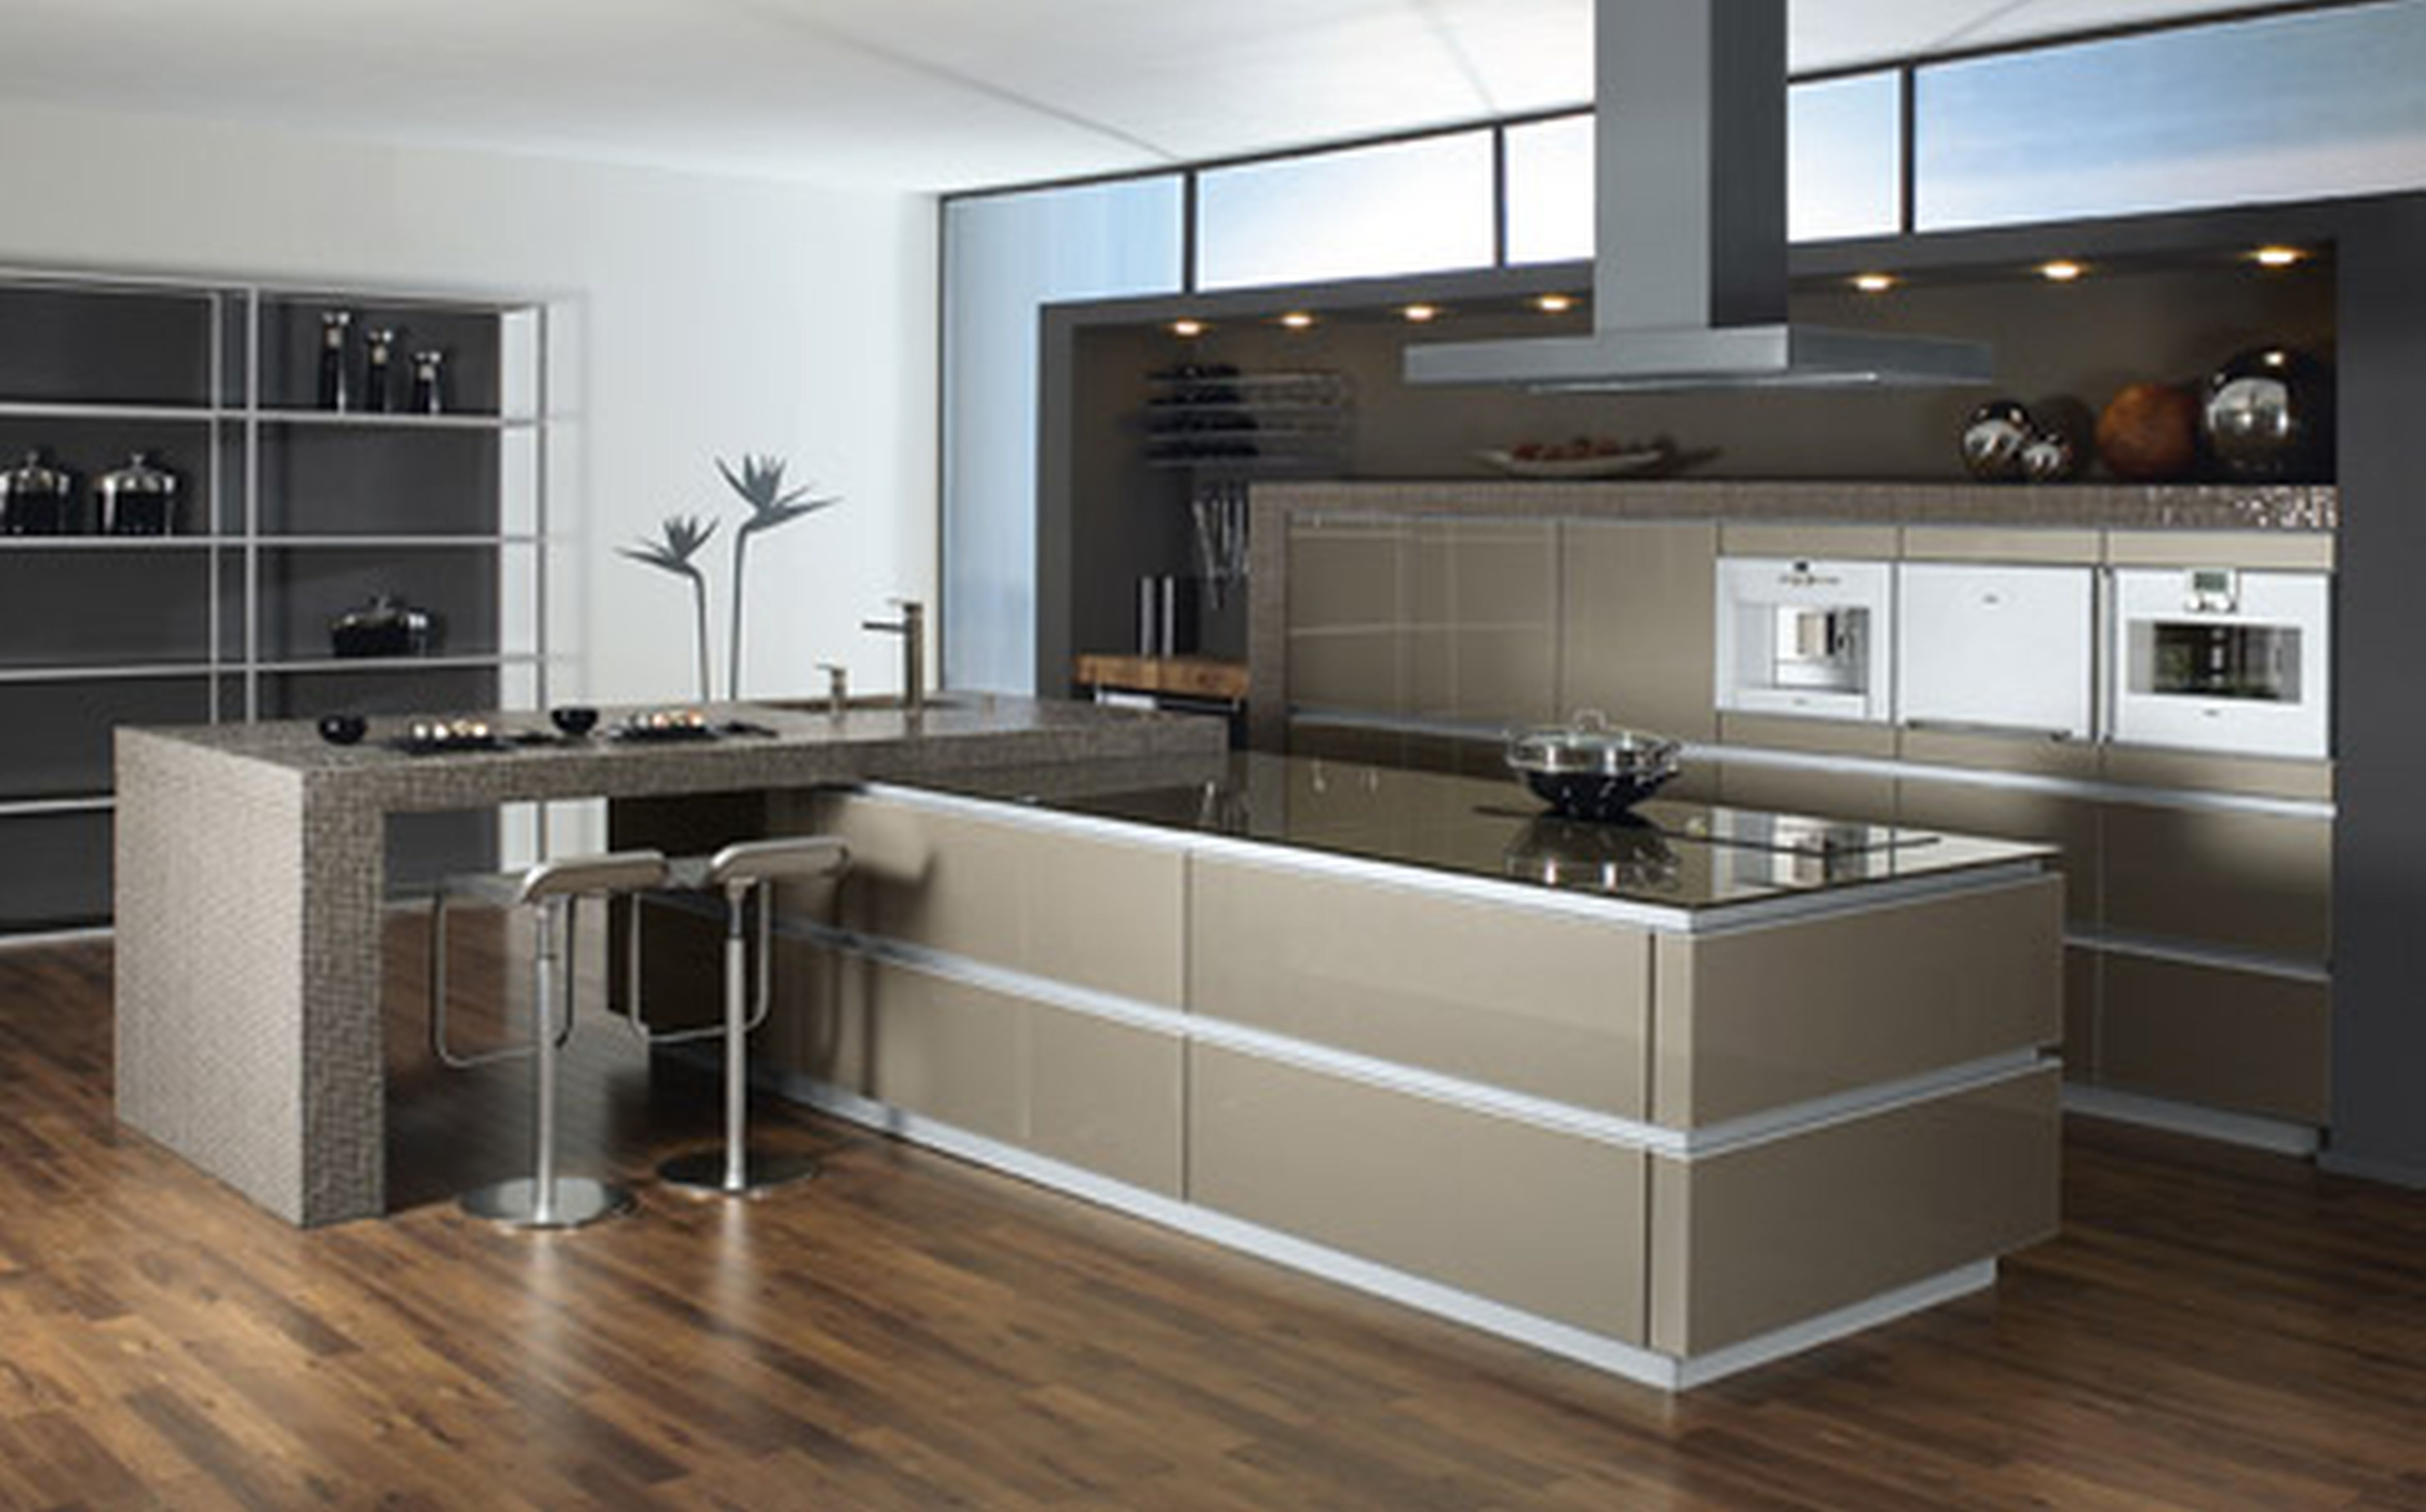 kitchen-backsplash-marvelous-modern-style-kitchen-backsplash-modern-style-kitchens-modern-style-kitchens-german-modern-style-kitchen-islands-modern-style-kitchens-german-modern-style-kitchen-fauc1